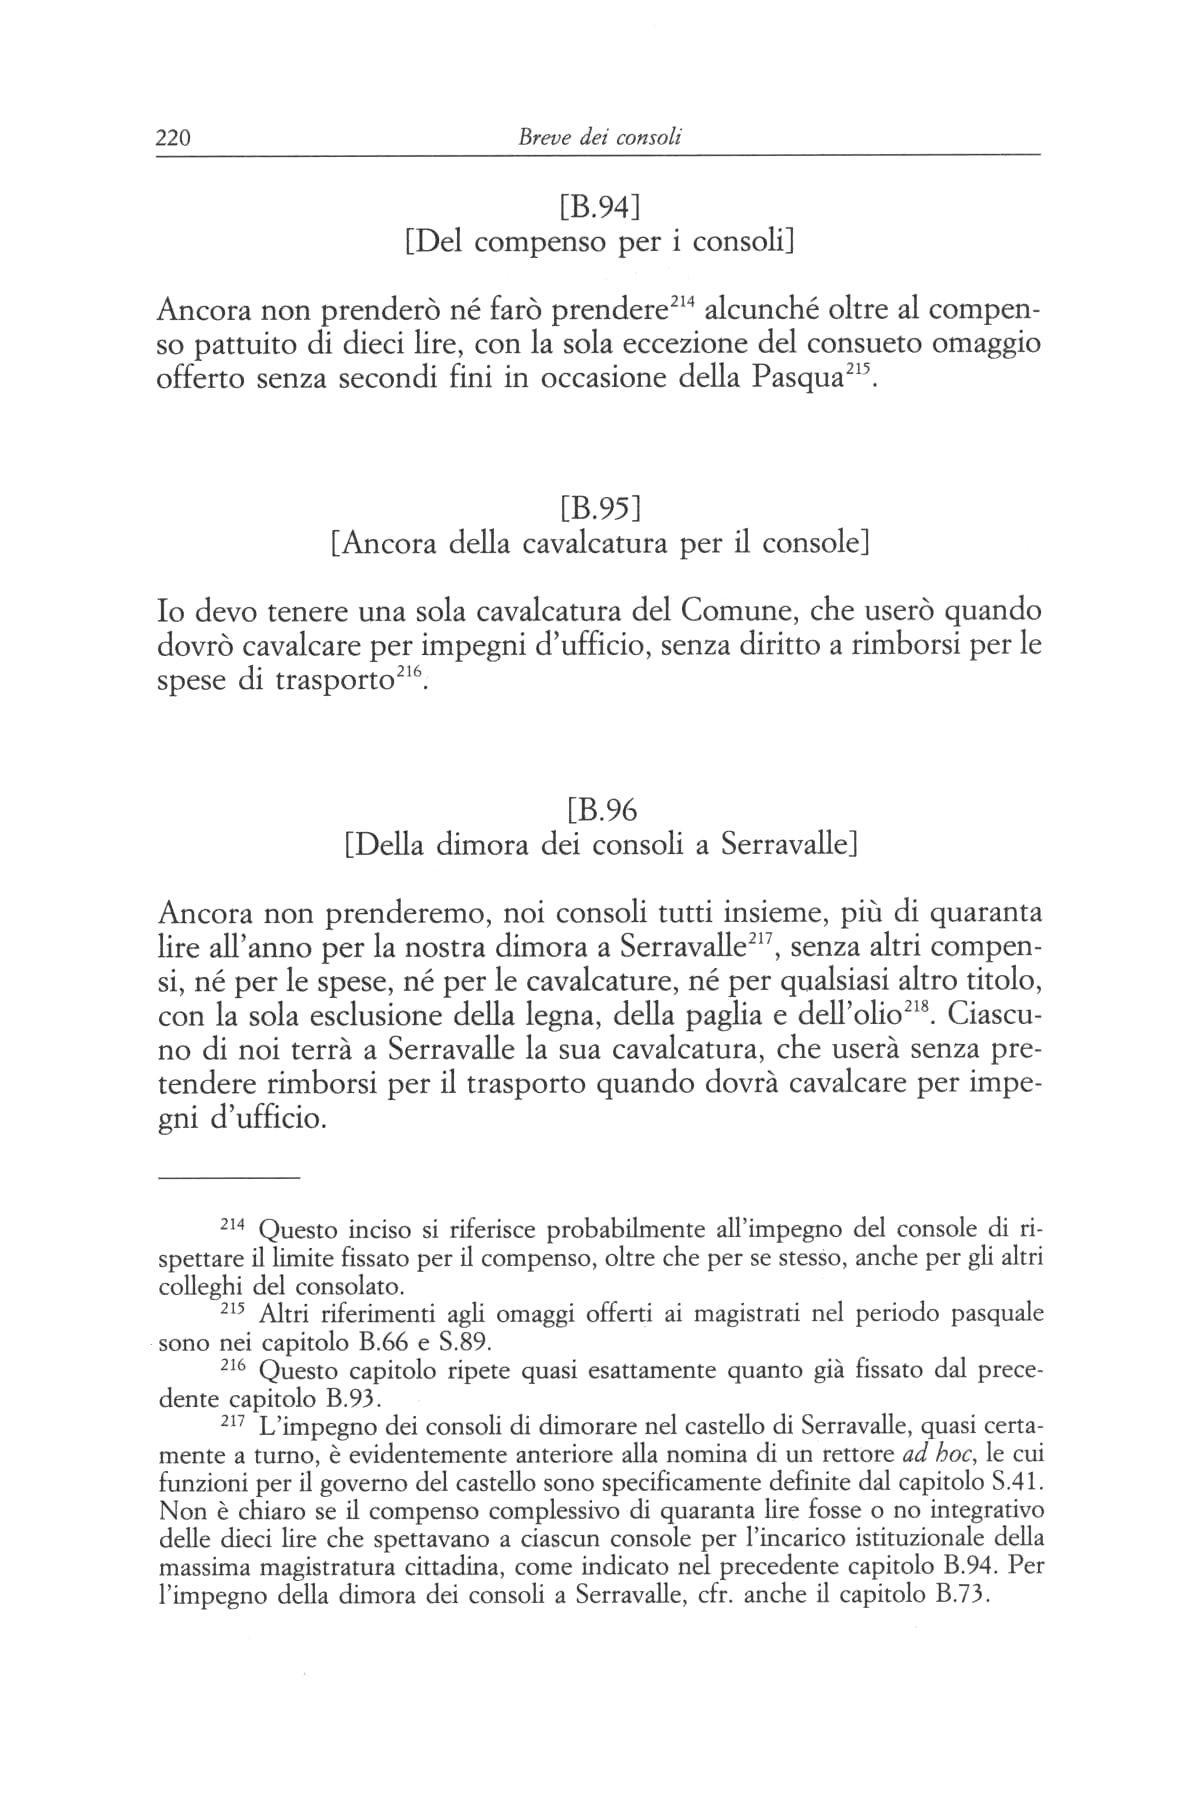 statuti pistoiesi del sec.XII 0220.jpg